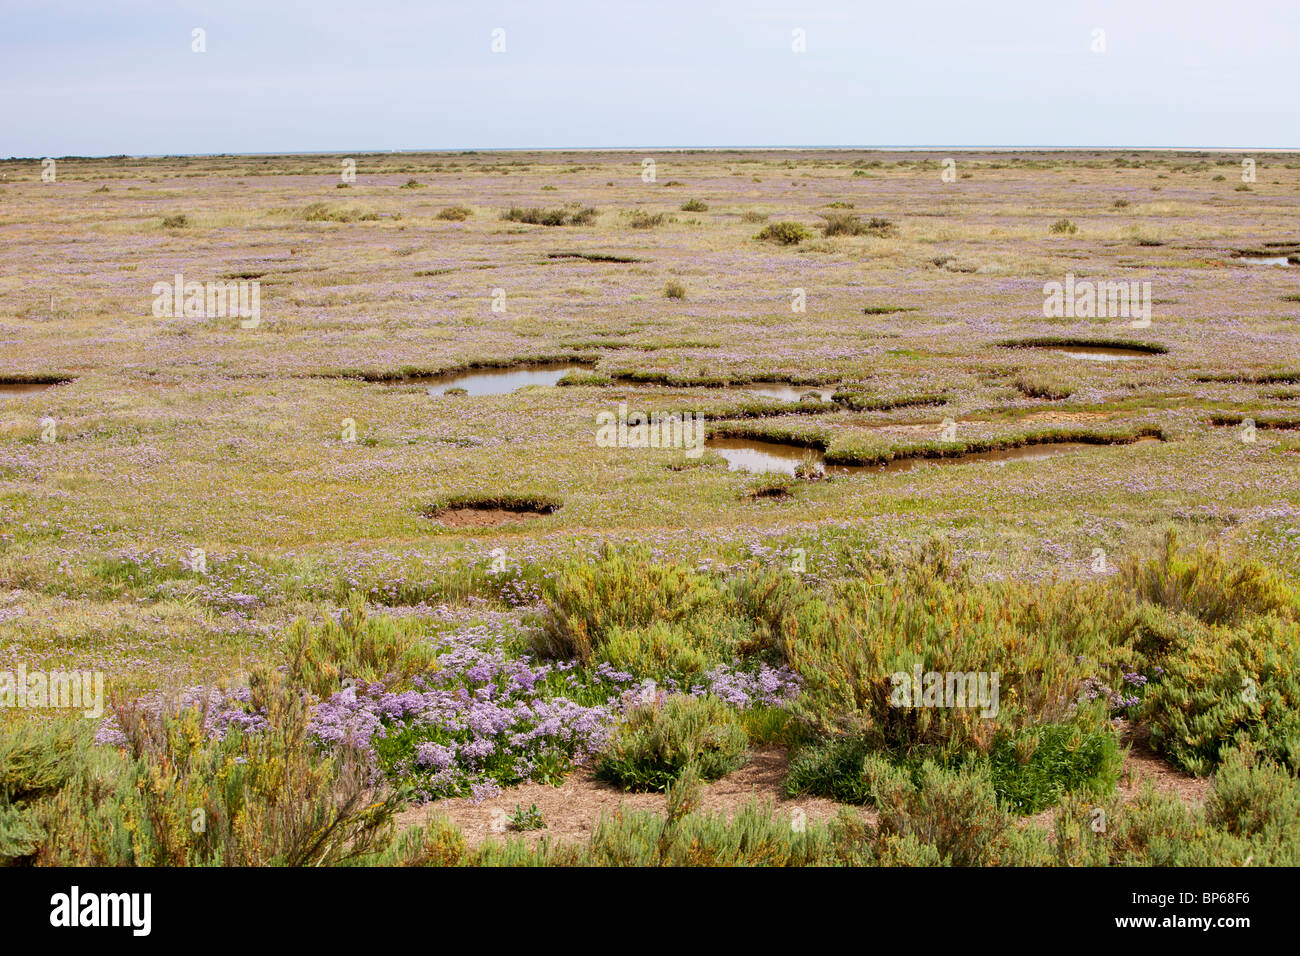 Sea Lavender or statice growing on salt marsh near Wells Next the Sea, Norfolk, UK. - Stock Image